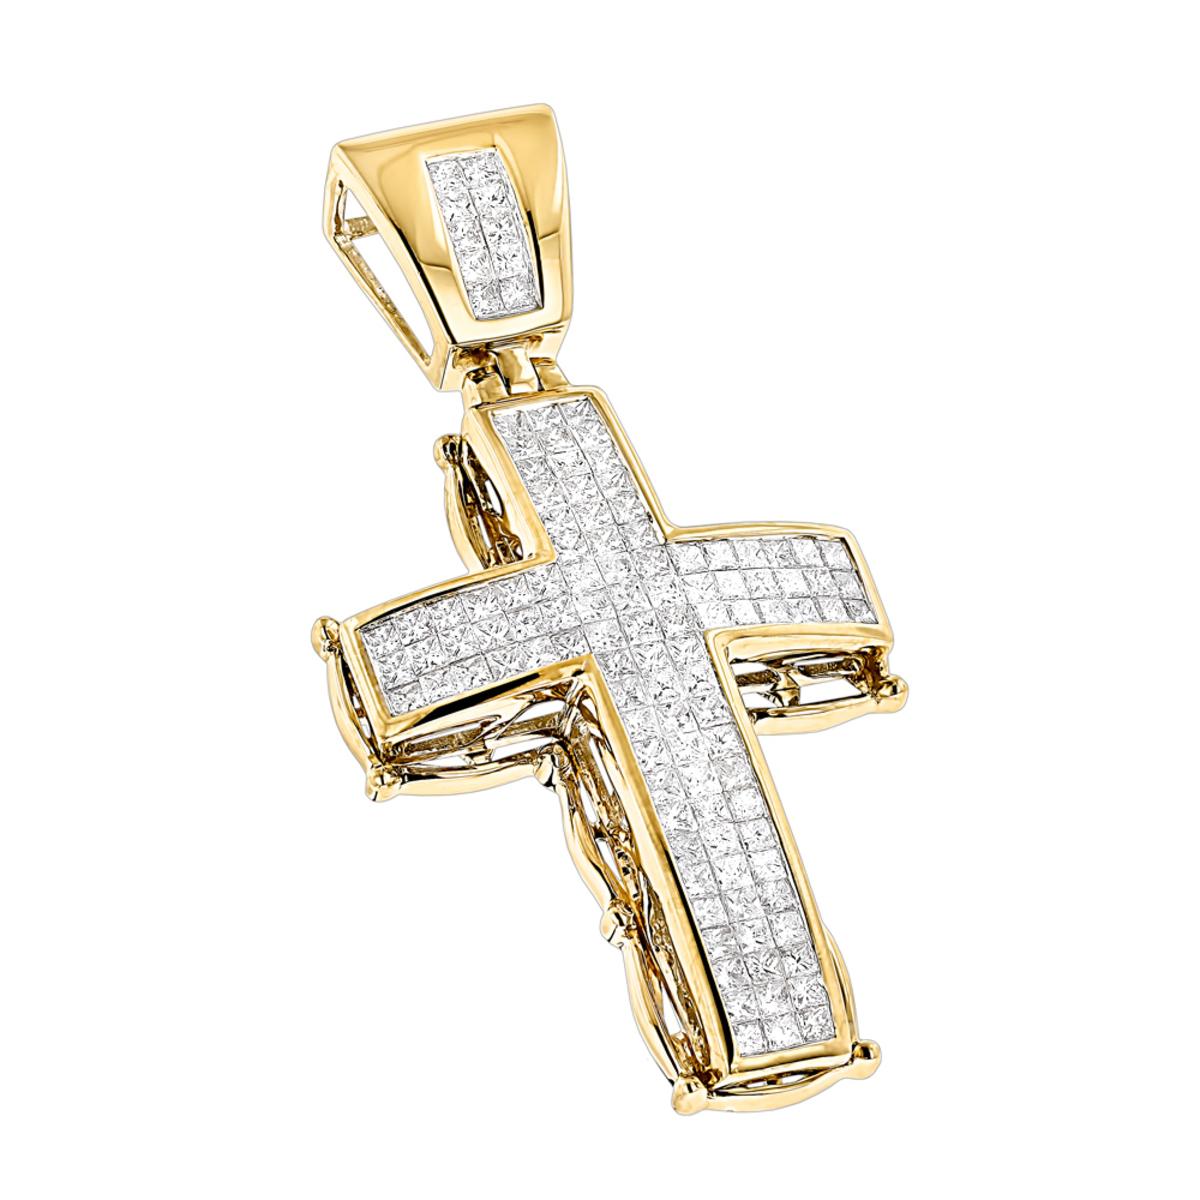 14K Gold Mens Cross Pendant w Princess Diamonds 2.25ct